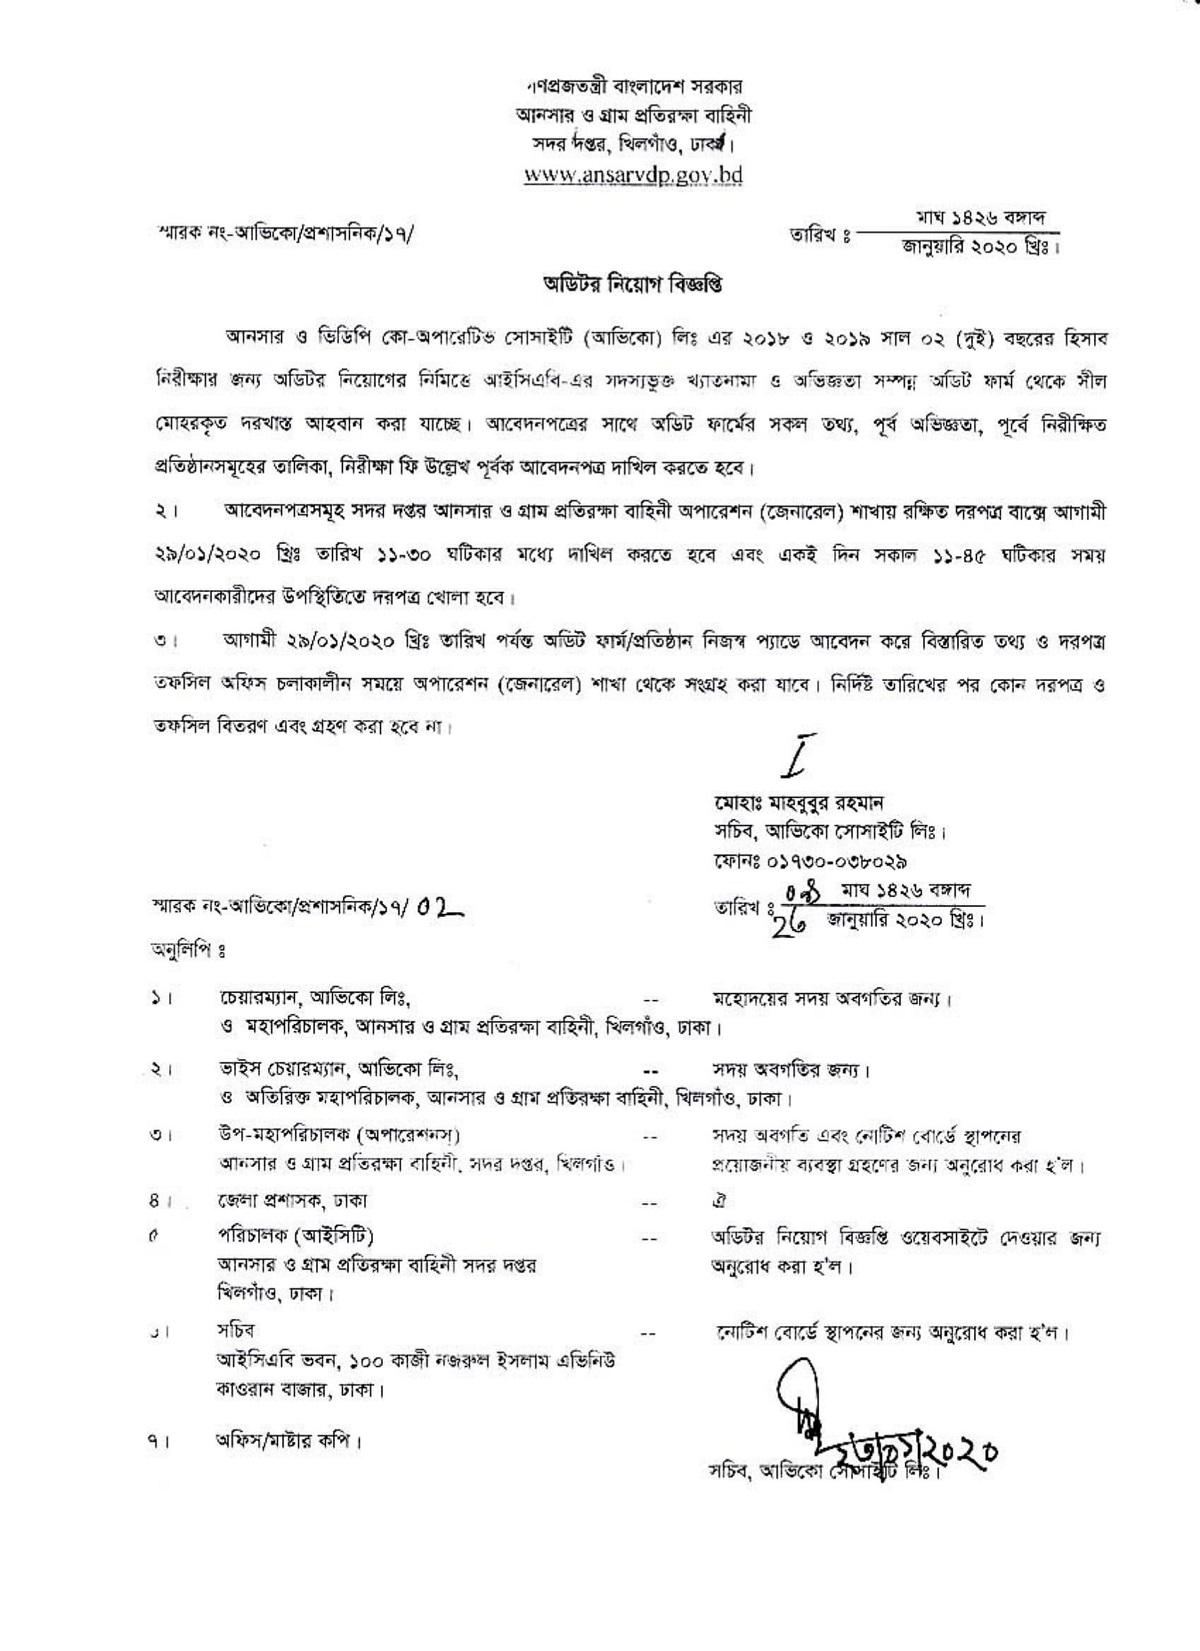 Bangladesh Ansar Bahini Job Circular 2020